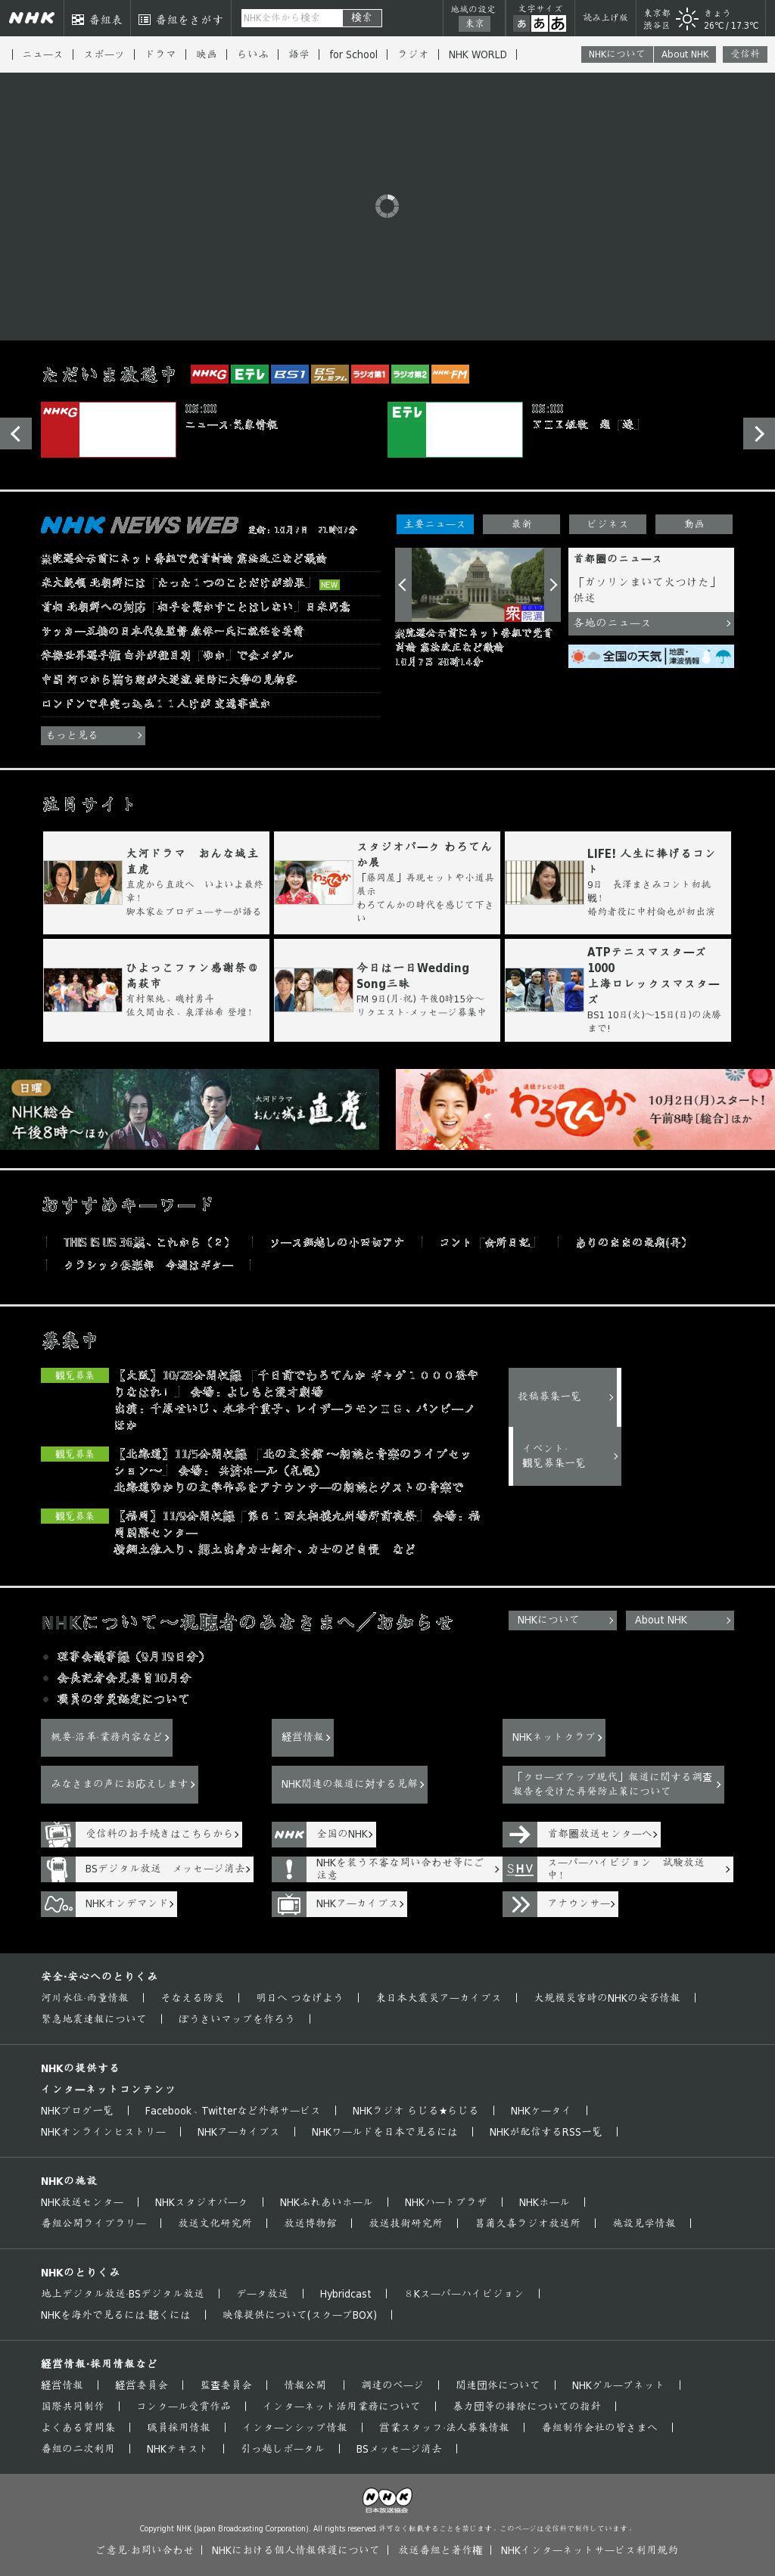 NHK Online at Saturday Oct. 7, 2017, 9:09 p.m. UTC